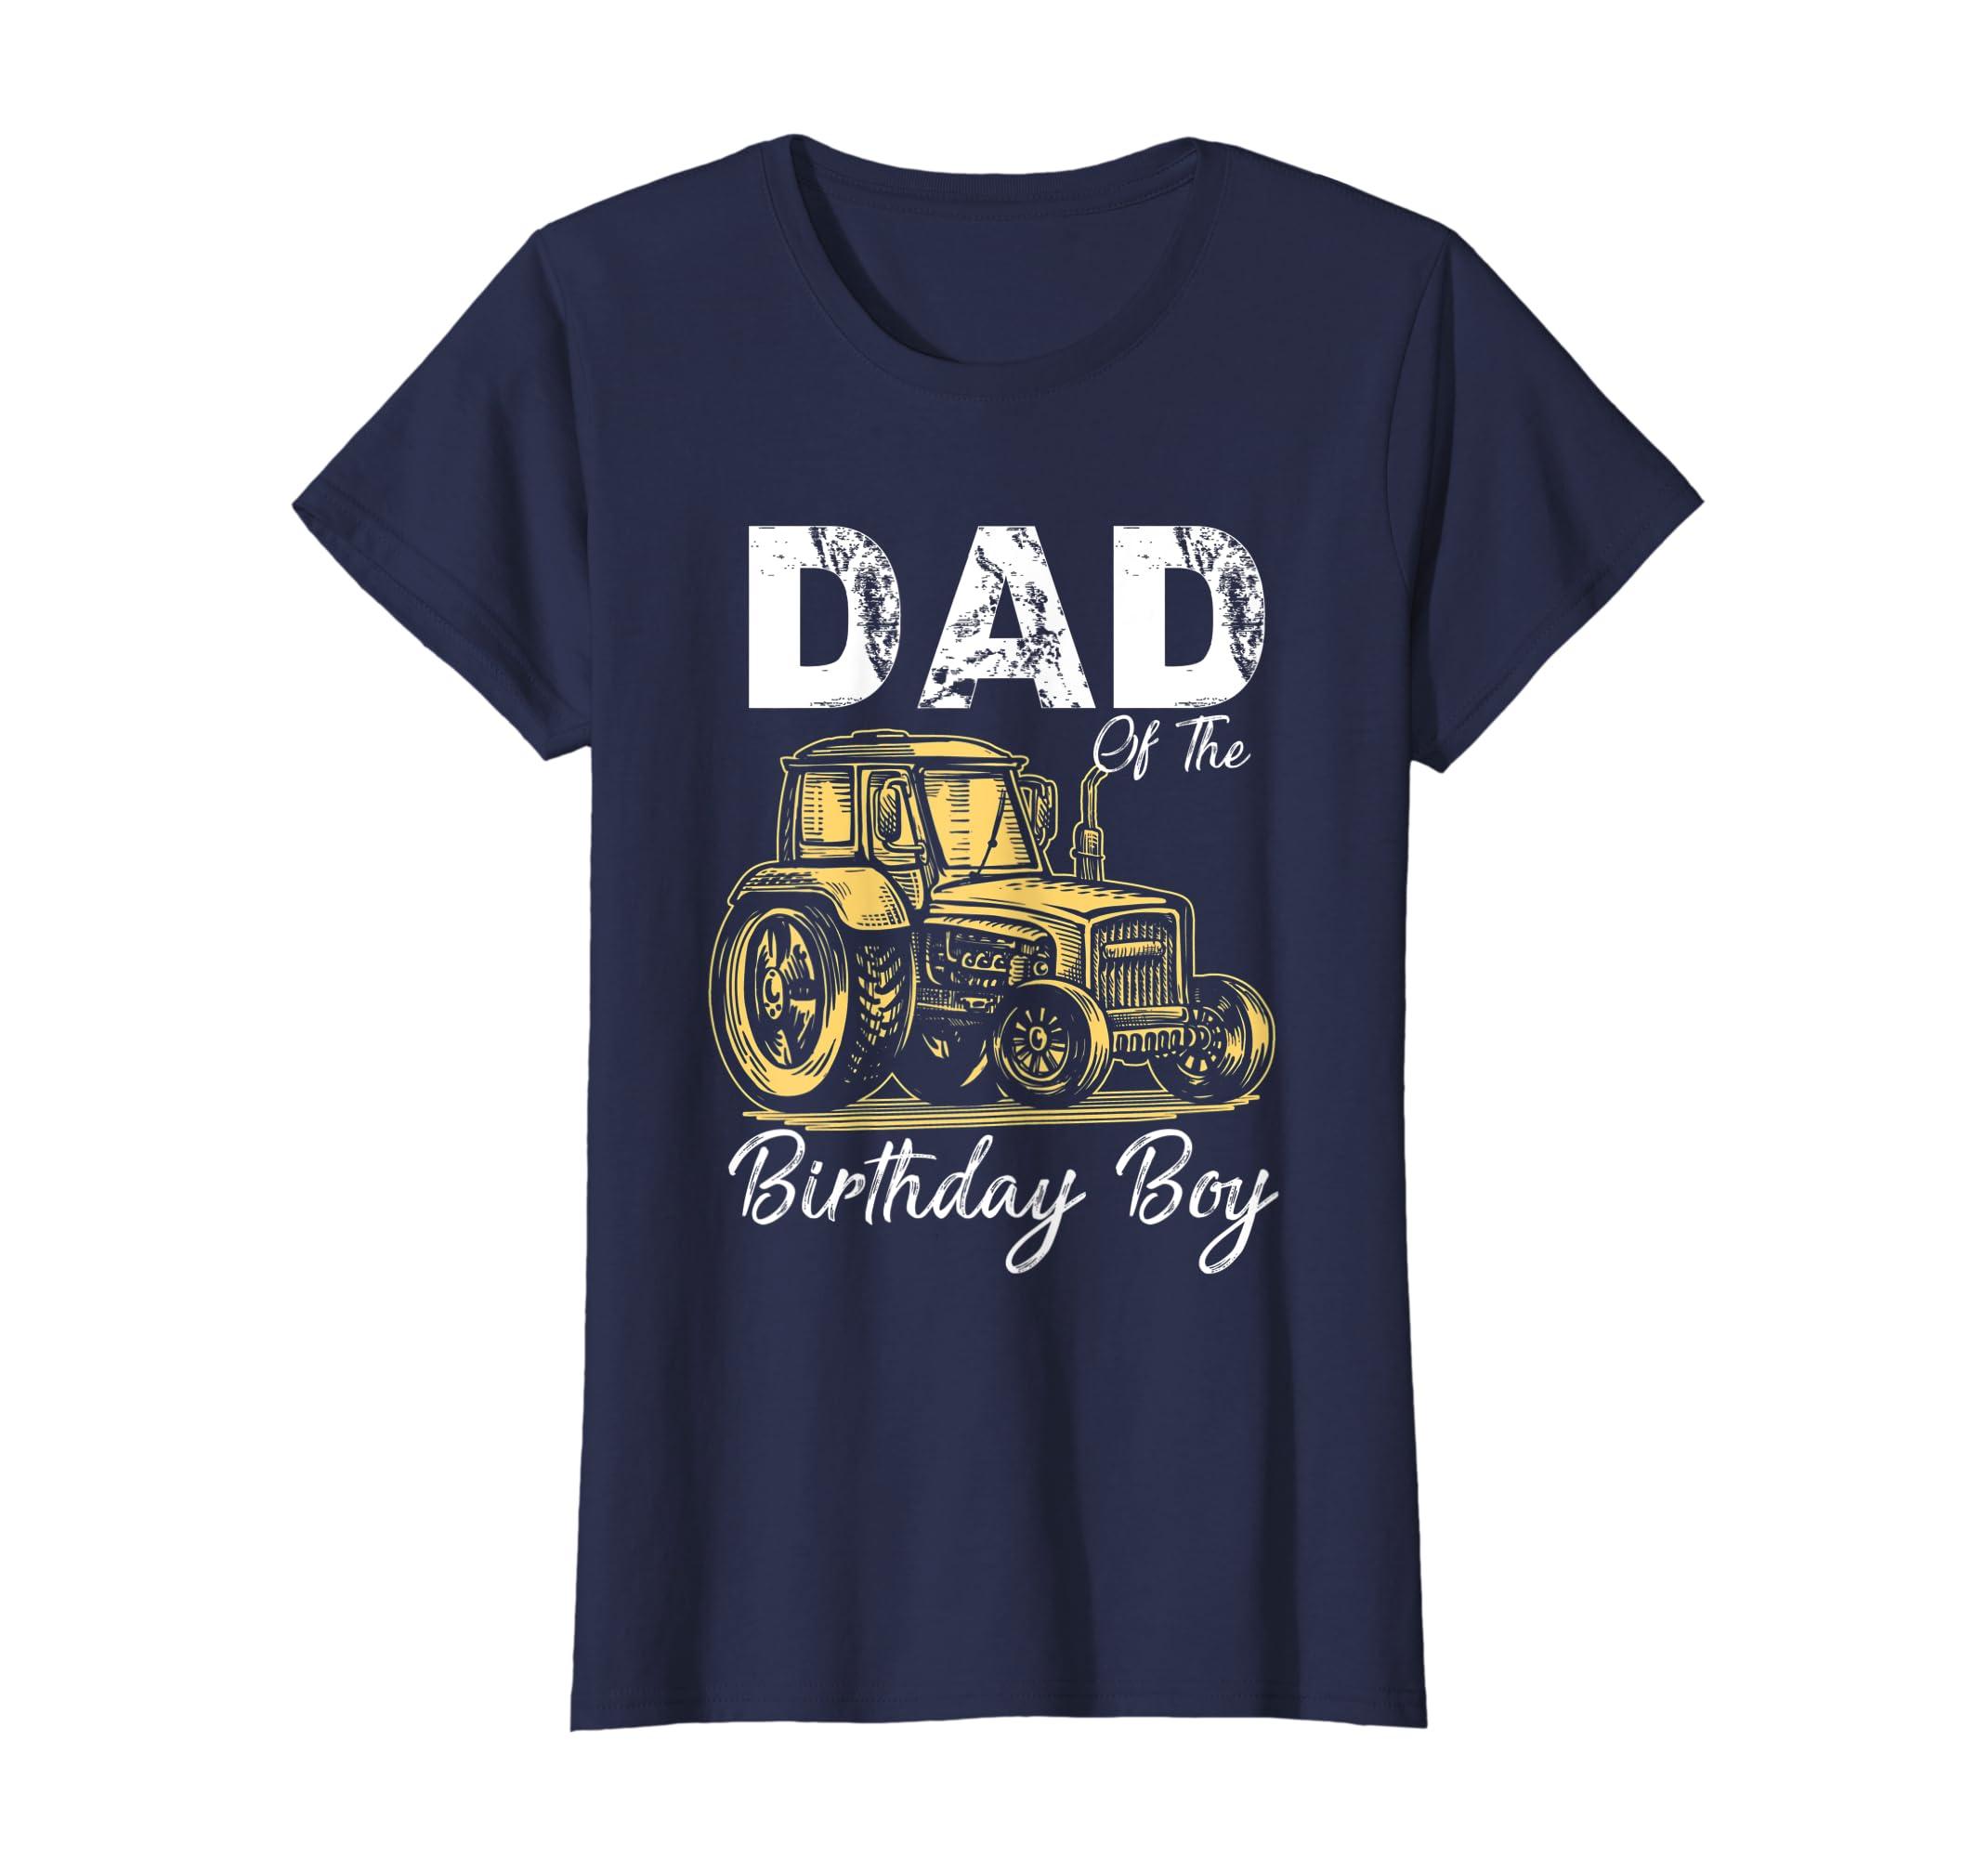 8384ebc27 Amazon.com: Dad Of The Birthday Boy Shirt Tractor Shirt Farm Party Tee:  Clothing